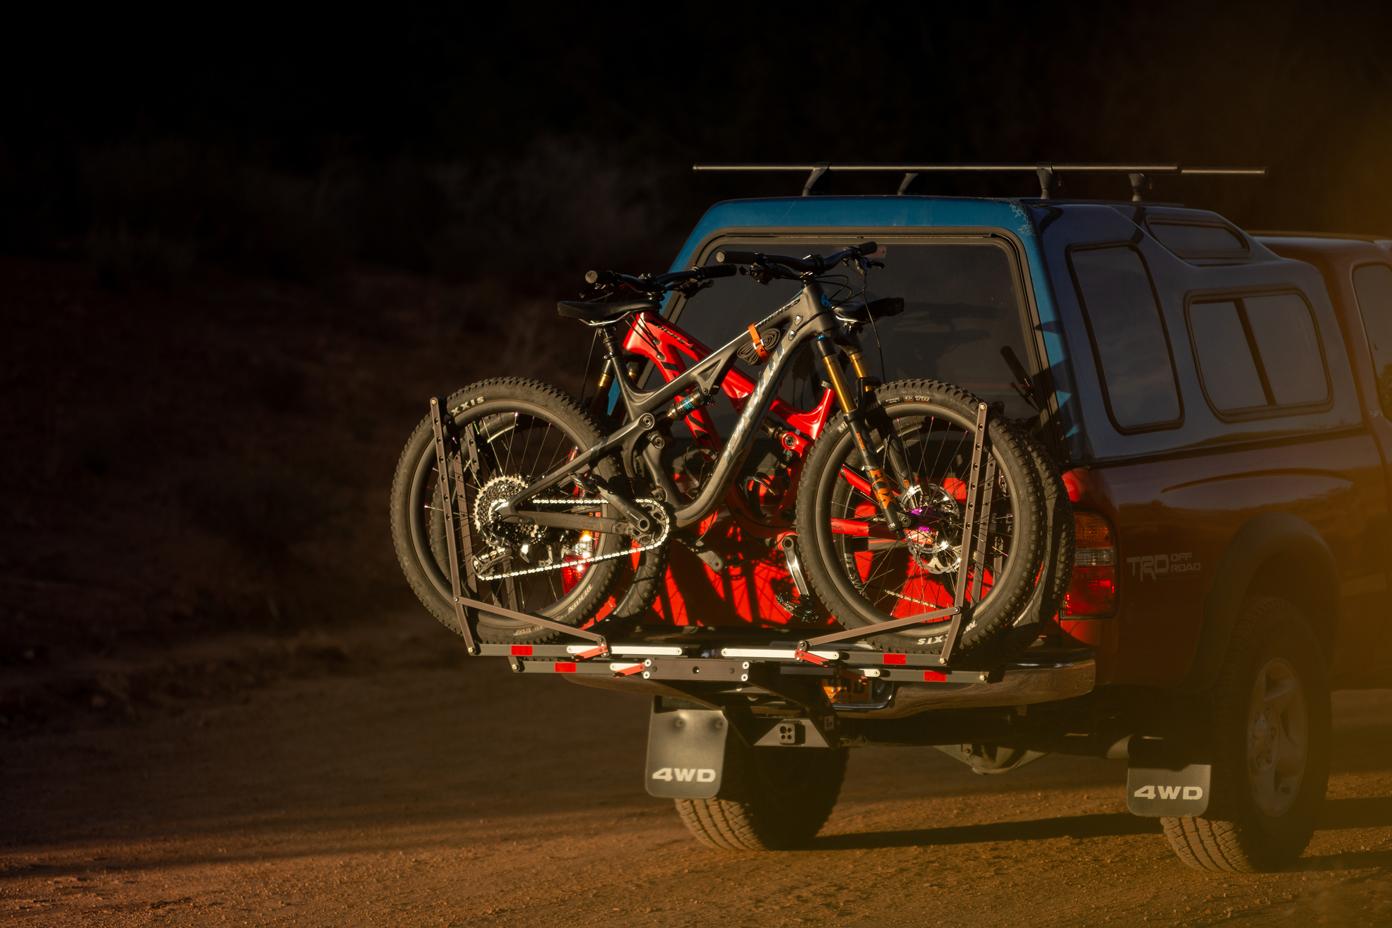 1up-usa-black-heavy-duty-double-rack-southern-utah-sunset.jpg